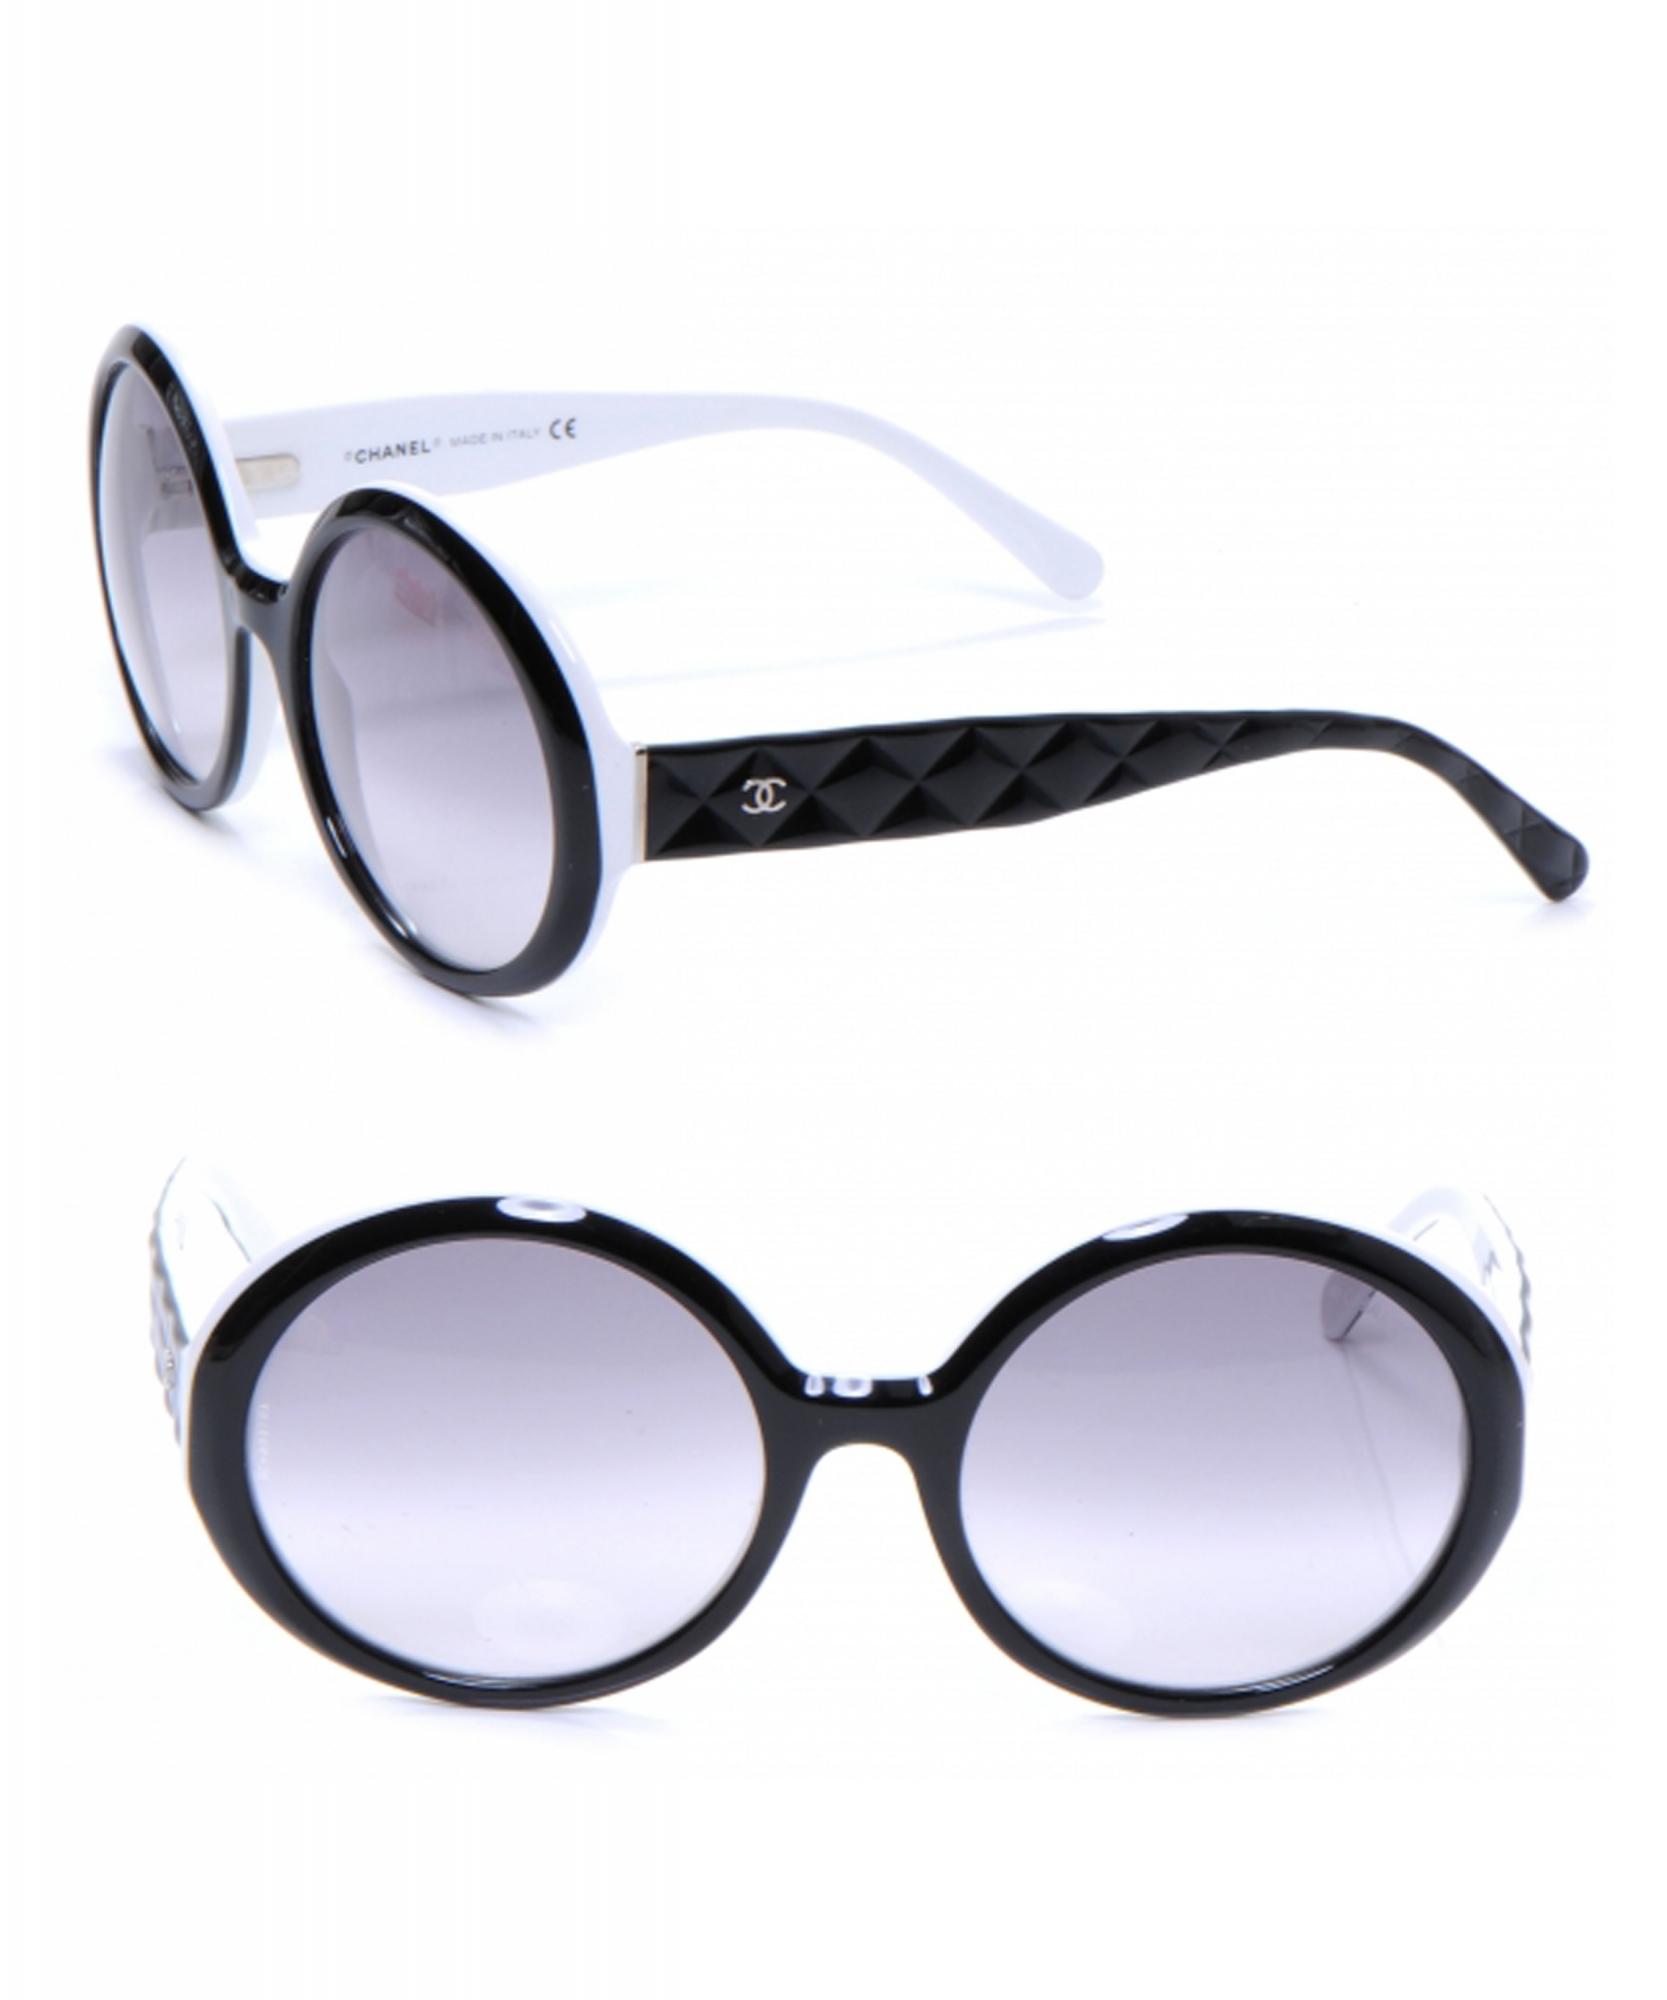 save up to 80% fashion style pretty nice Chanel Sunglasses 5120 Black & White - Chanel | La Doyenne